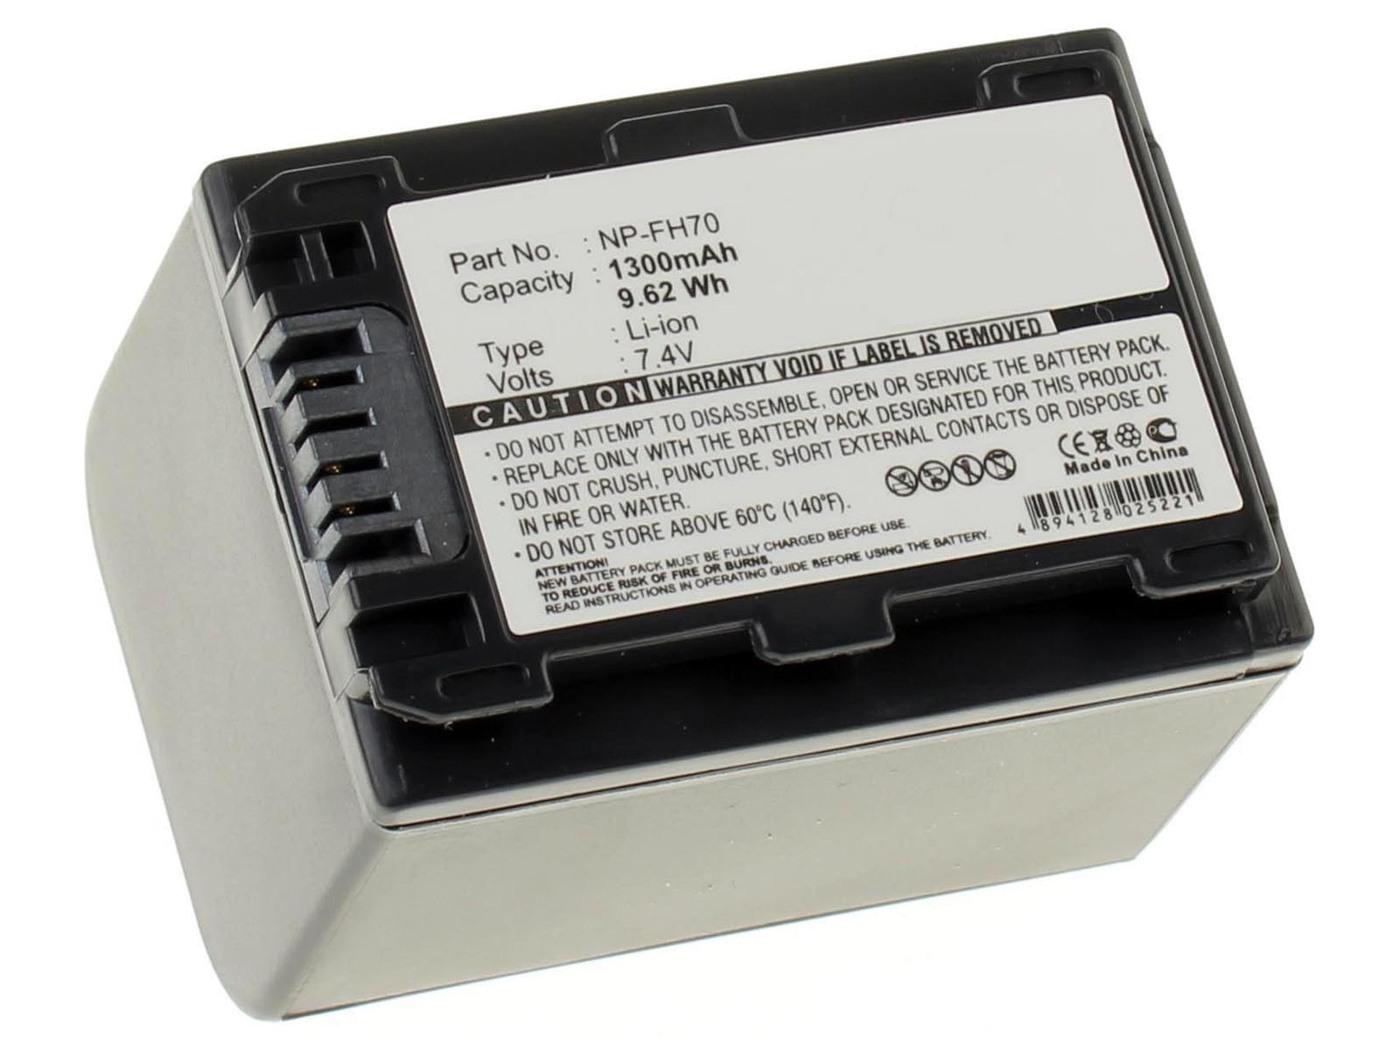 Аккумуляторная батарея iBatt iB-T7-F284 1300mAh для камер Sony HDR-CX106E, HDR-SR7, HDR-UX20E, DCR-SR32, DCR-SR35E, HDR-UX10, HDR-UX10E, DCR-SR35, HDR-UX20, DCR-DVD110, DCR-DVD115E, DCR-HC37E, DCR-SR52, DCR-SR55, DCR-SR55E, HDR-SR8, DCR-DVD110E,